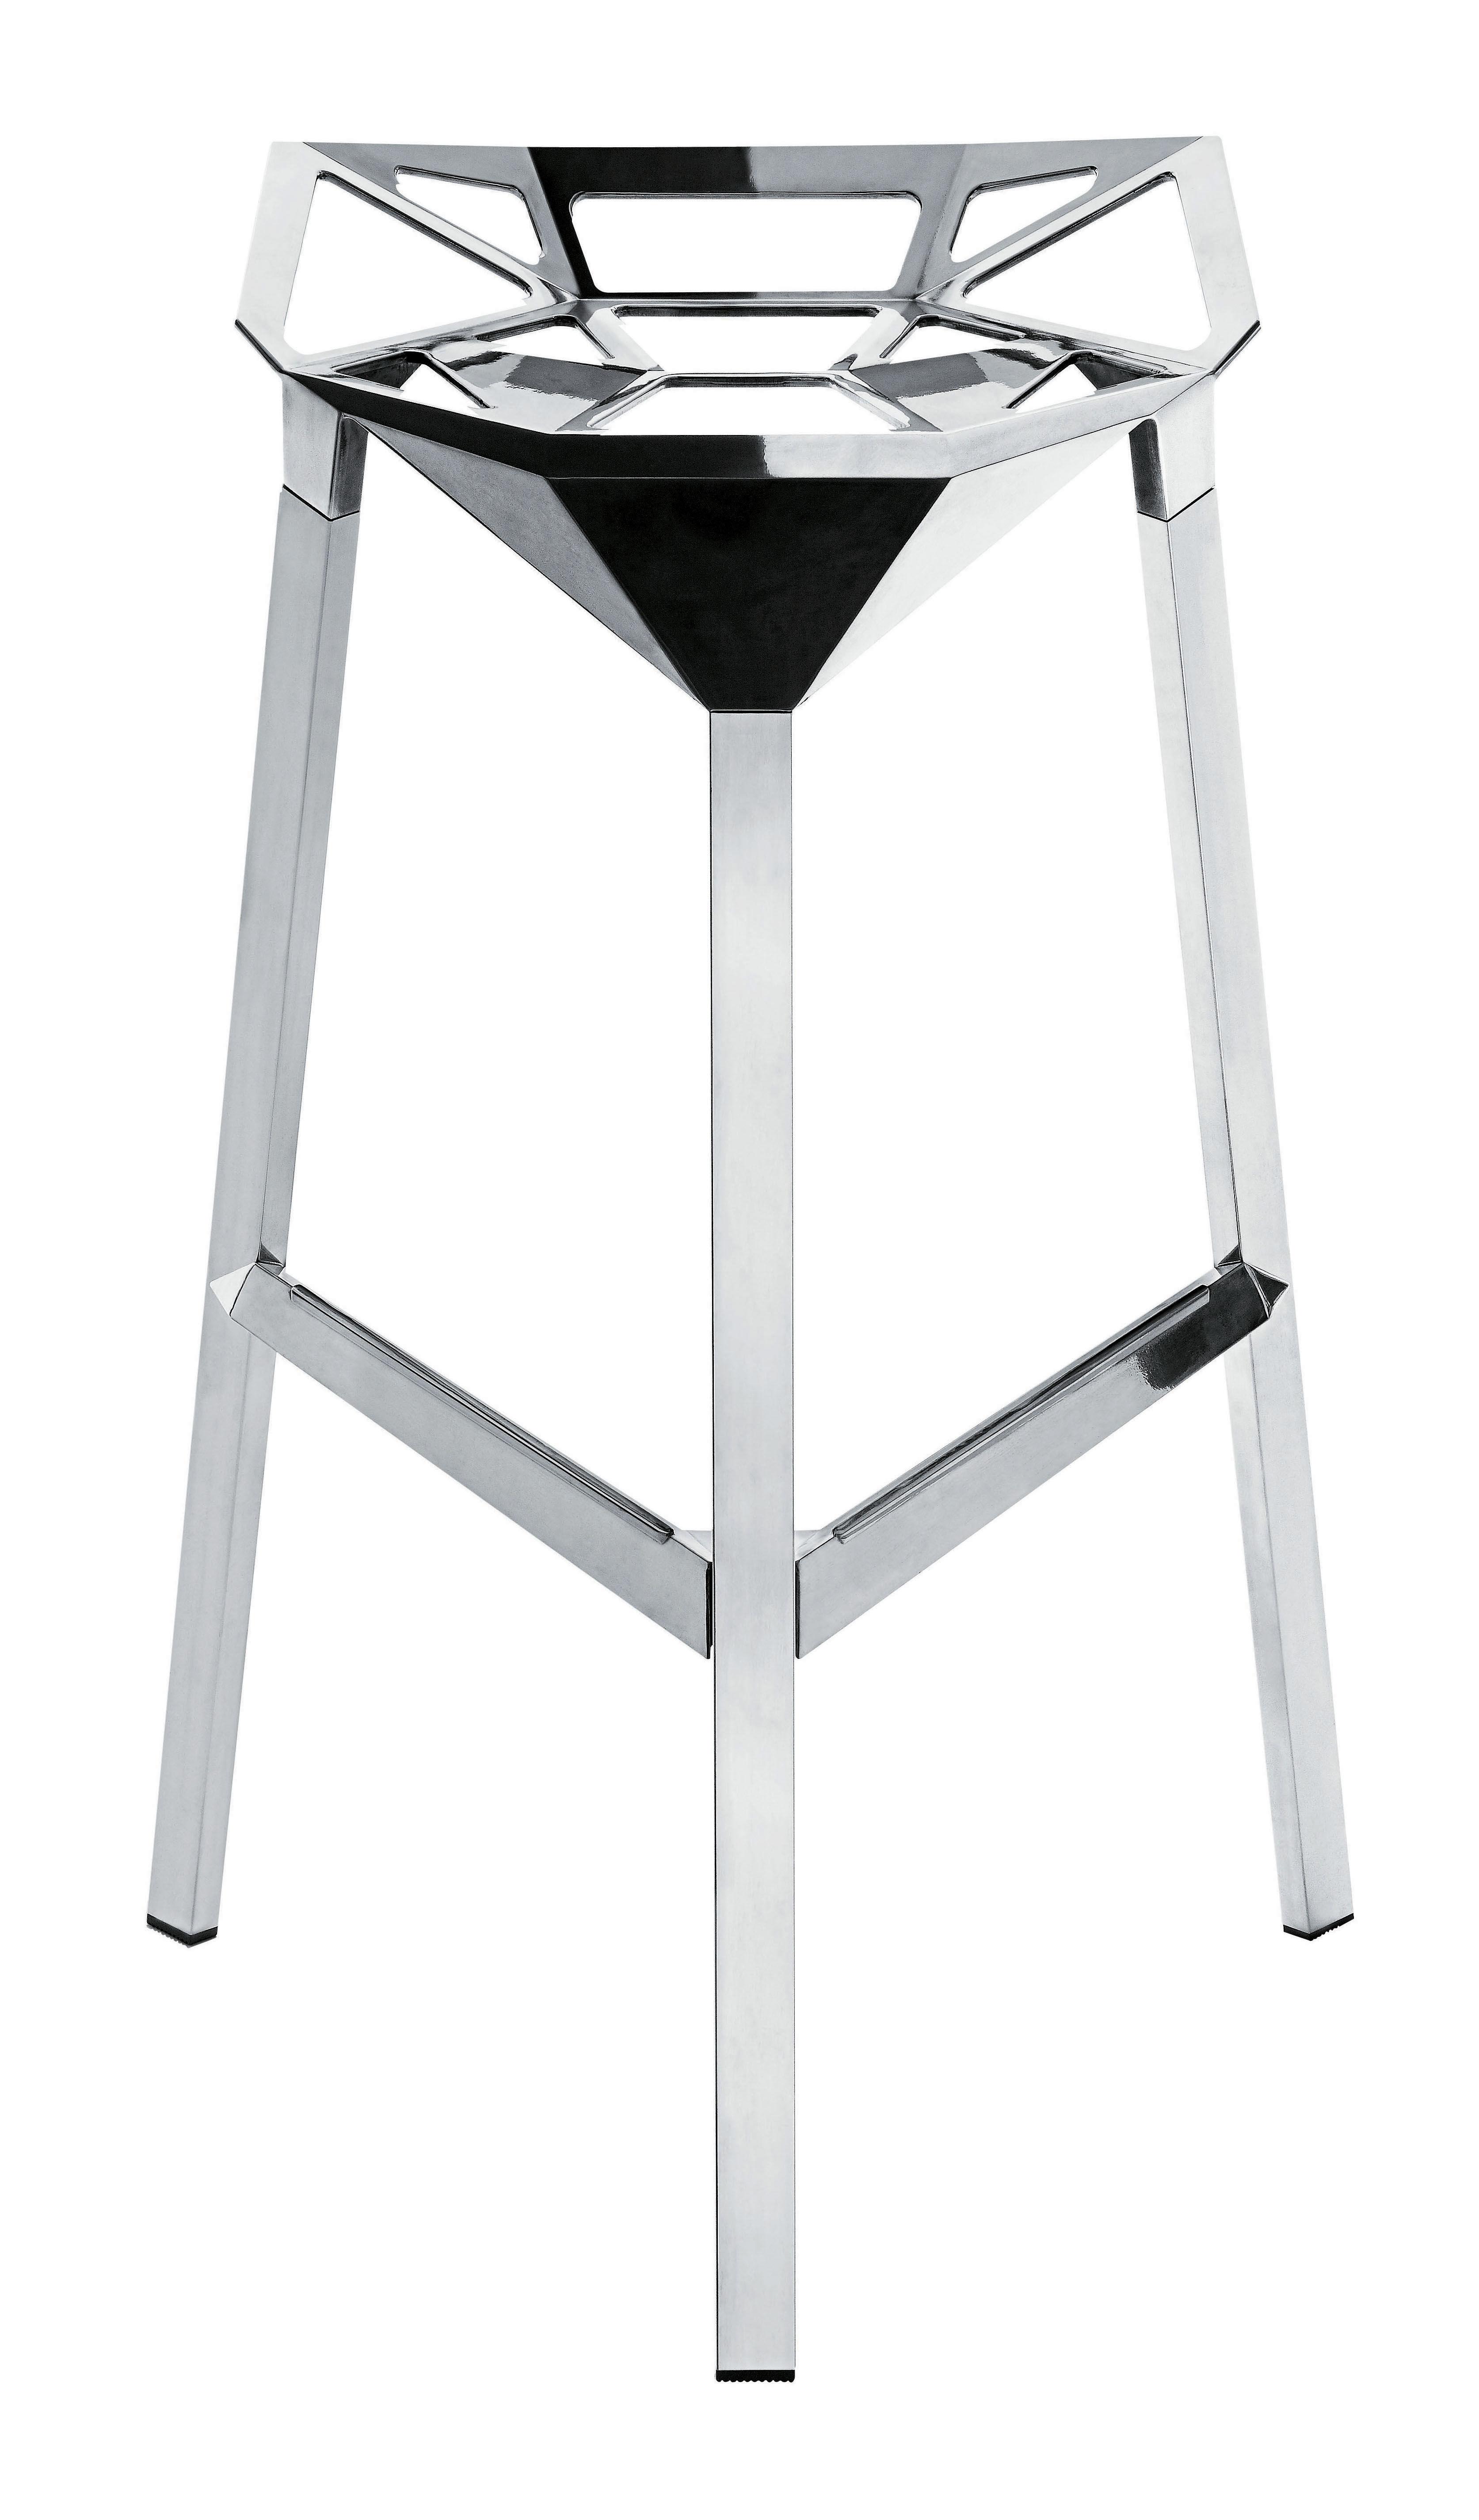 Mobilier - Tabourets de bar - Tabouret de bar Stool One / H 77 cm - Version Alu poli - Magis - Alu poli - Aluminium